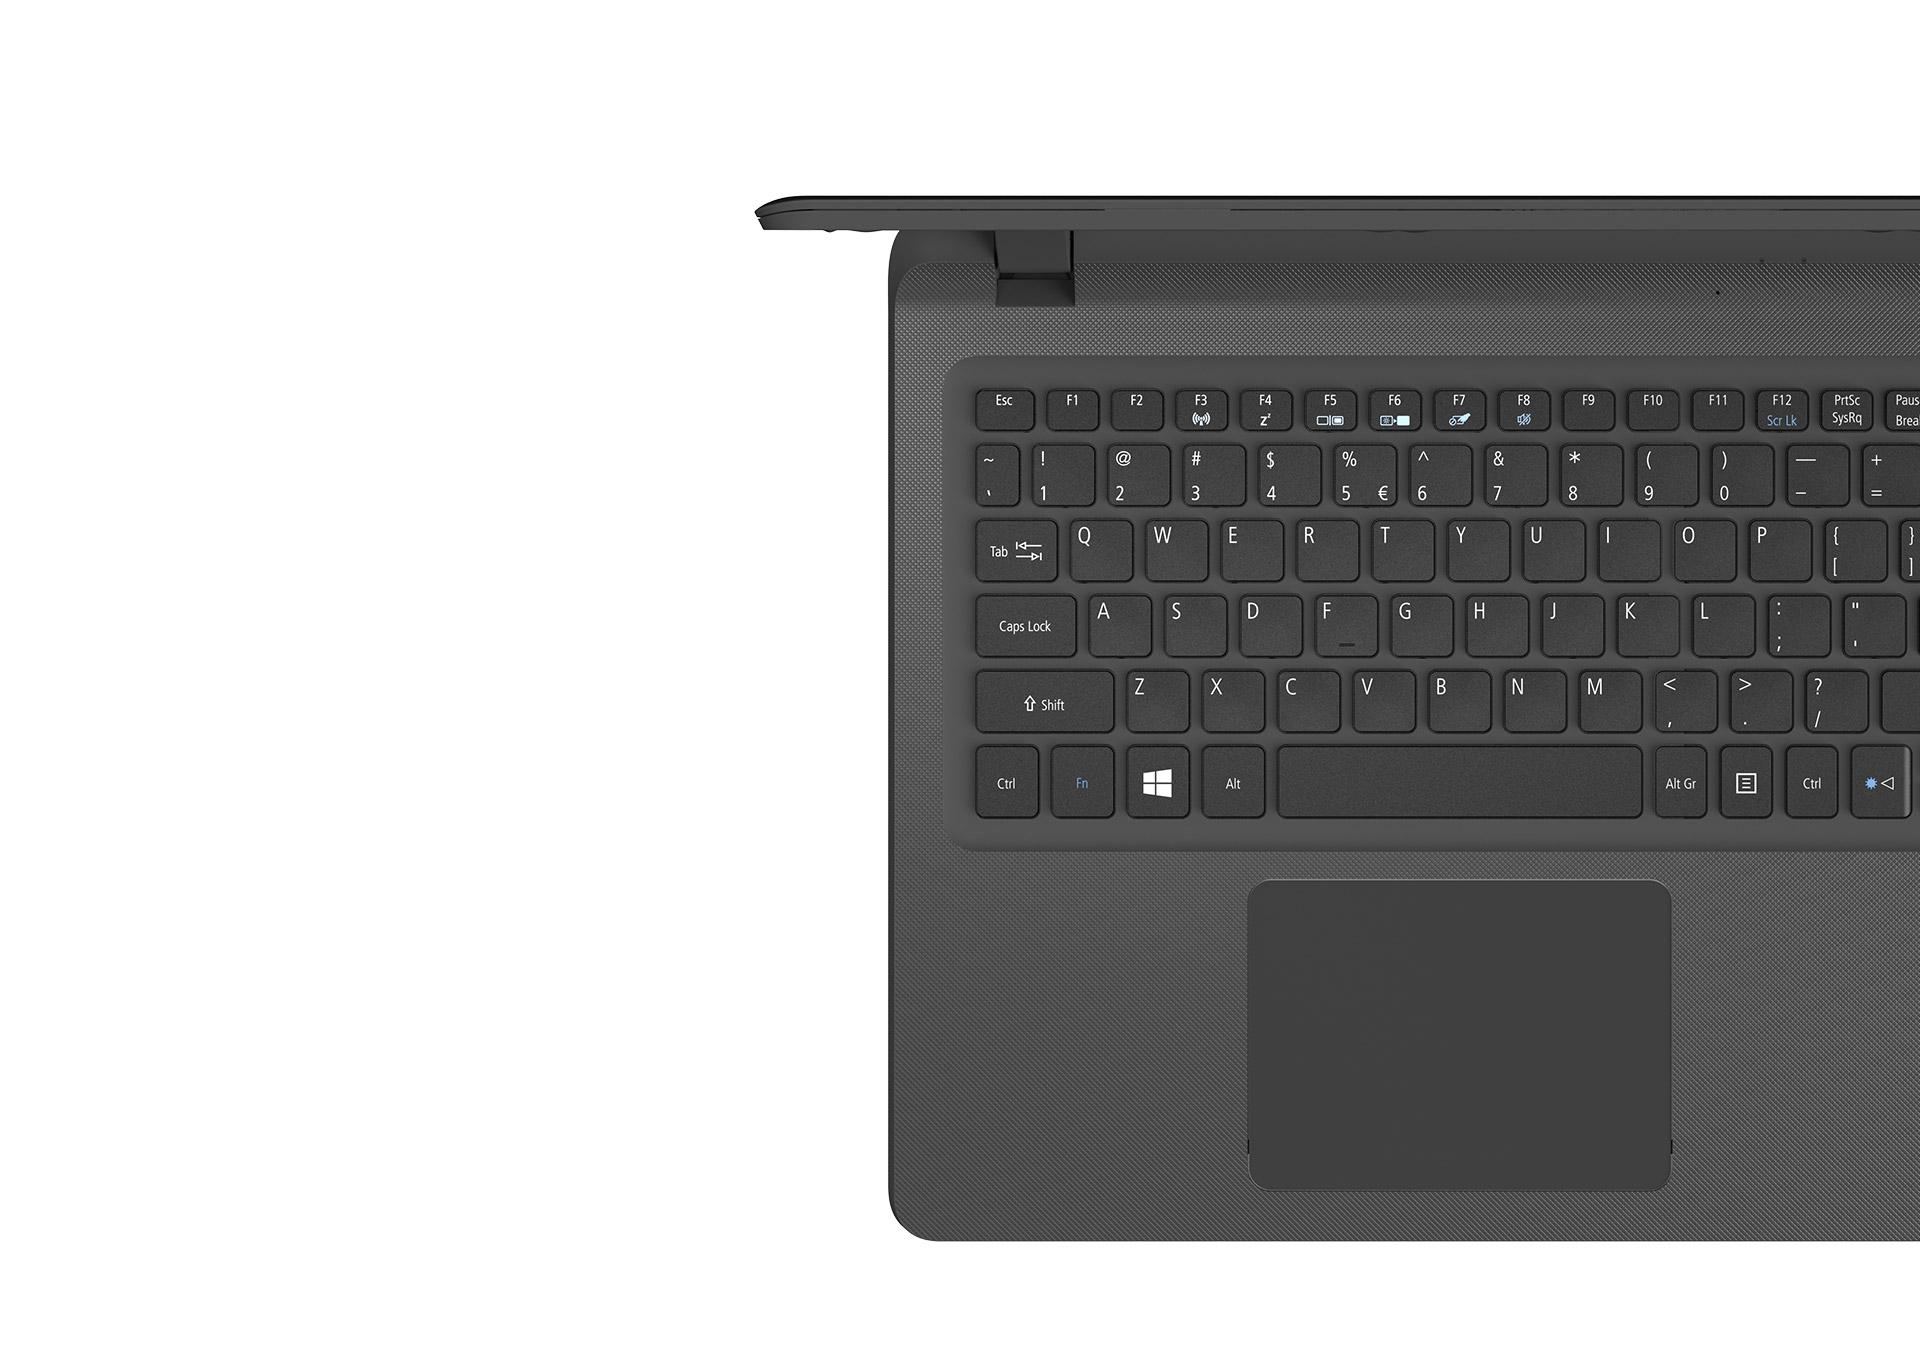 Extensa 15 - design Precision Touchpad ksp - Large